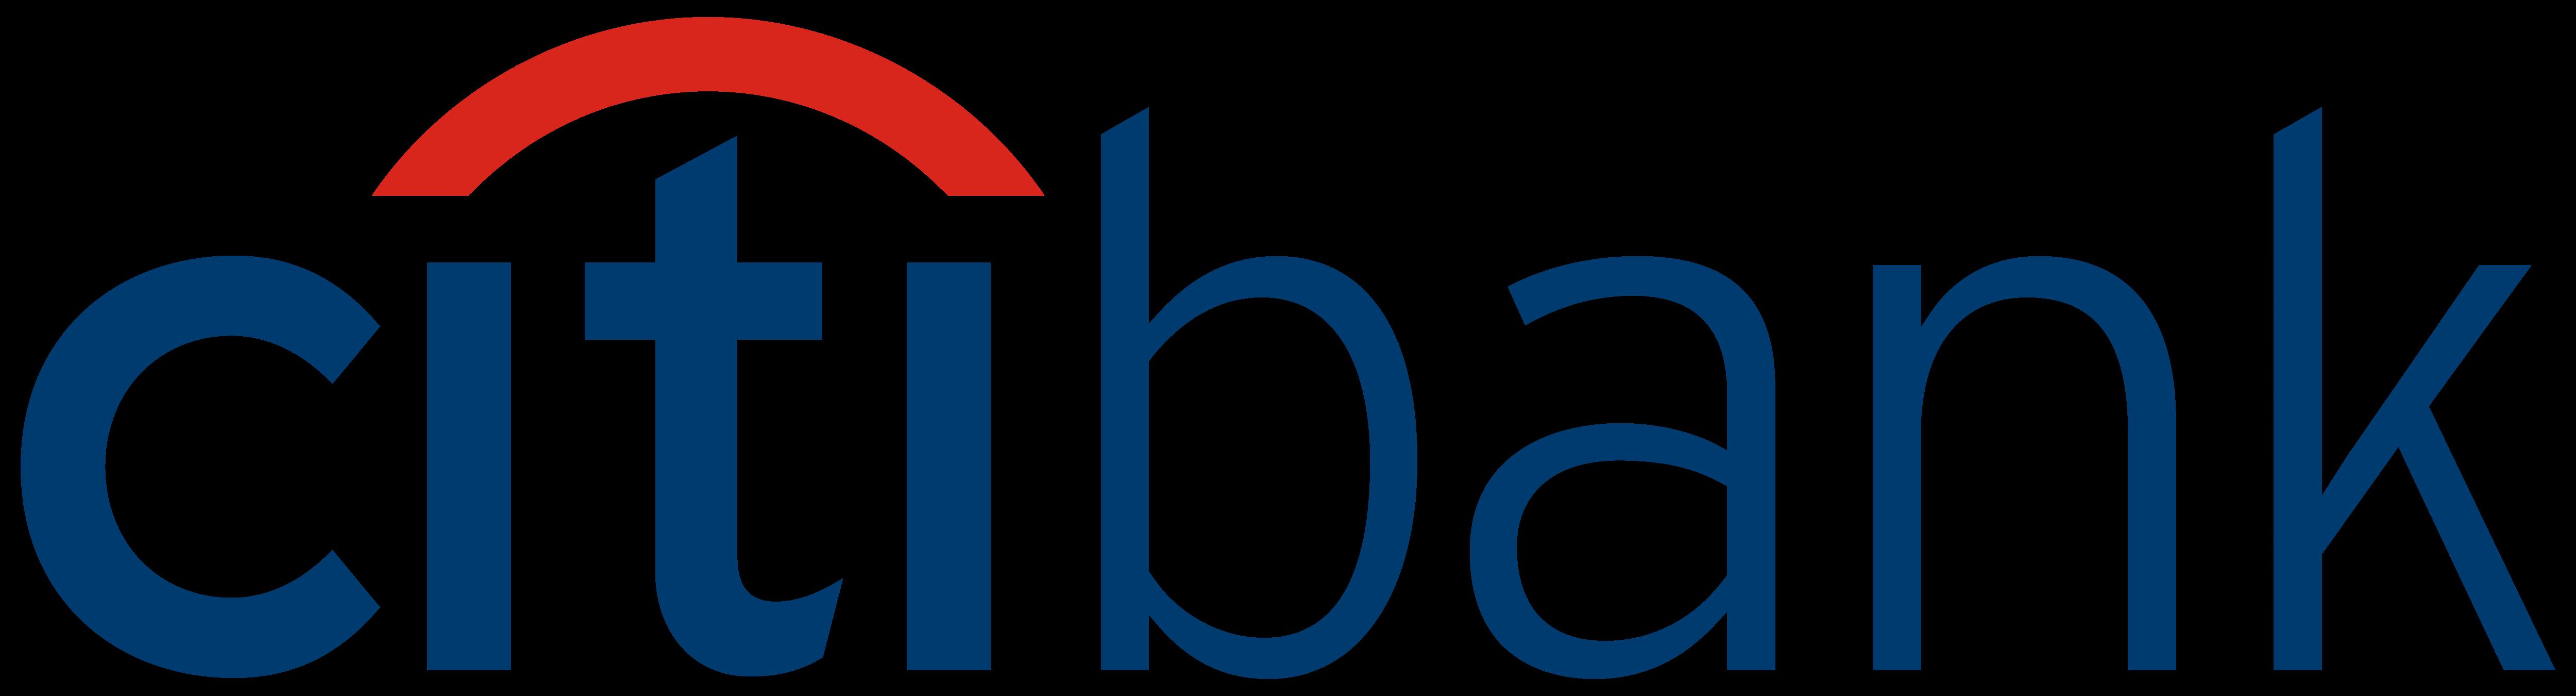 Citibank Wave Analysis – 25 November, 2019